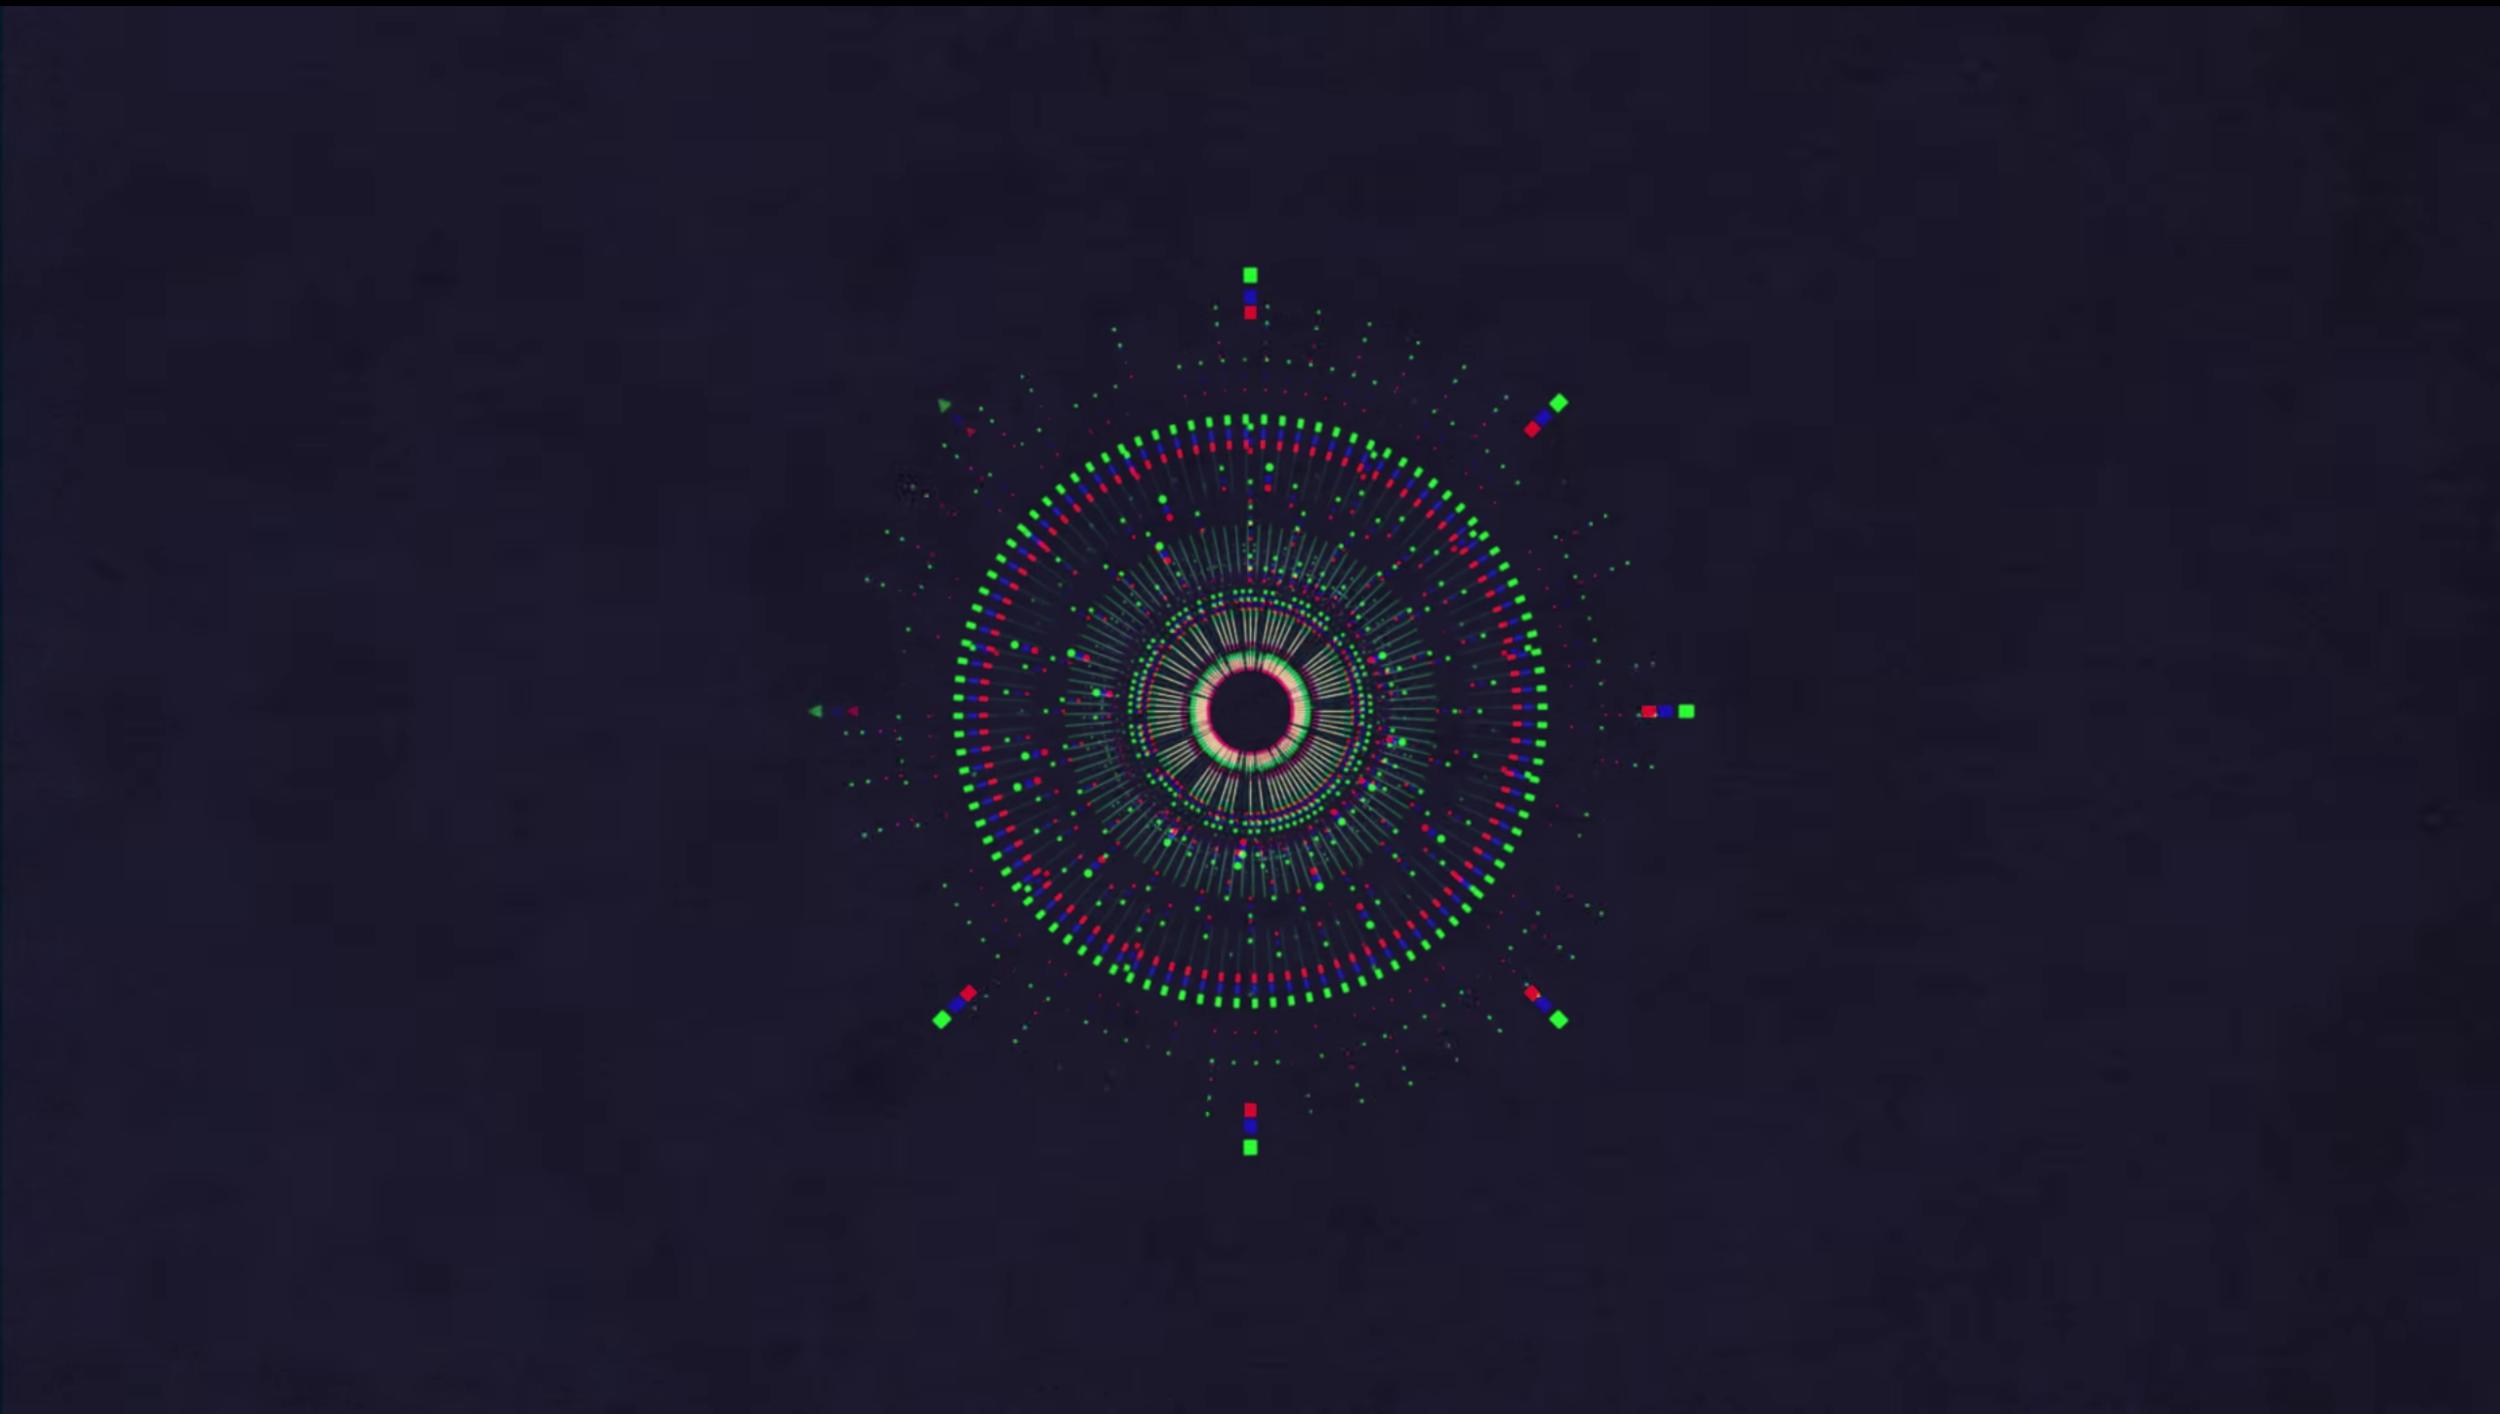 Screenshot 2016-01-19 23.50.41.png